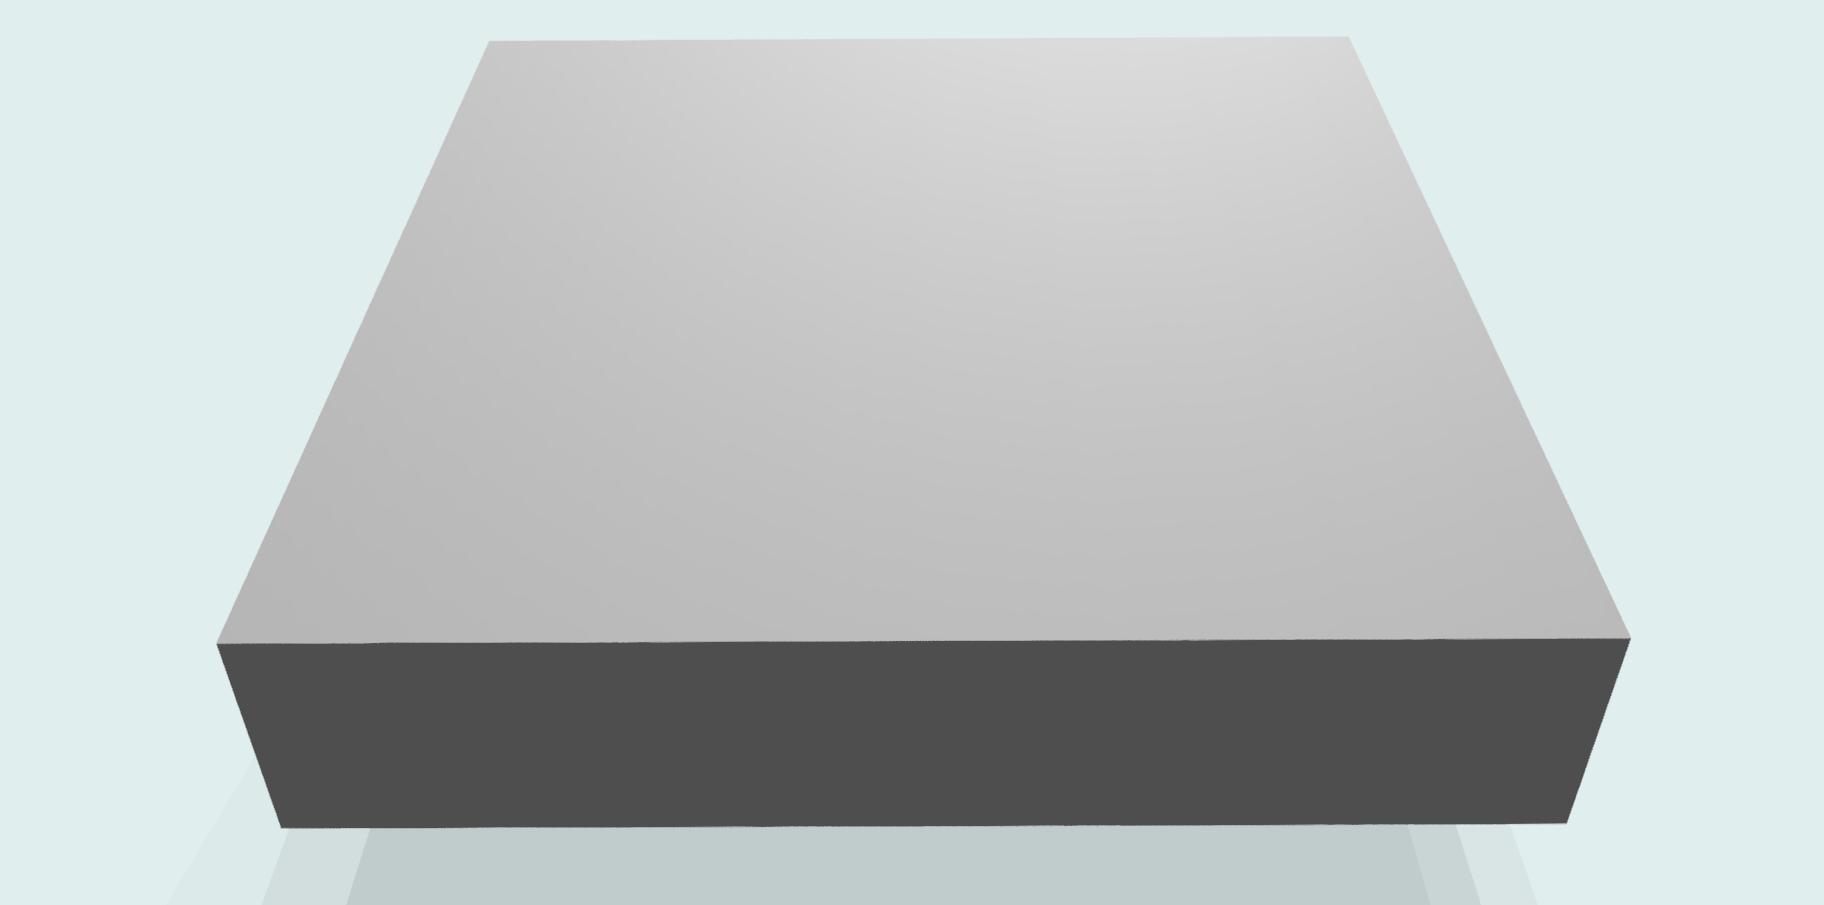 Tischplatte 30 mm melaminharzbeschichtet RAL 7035, grau